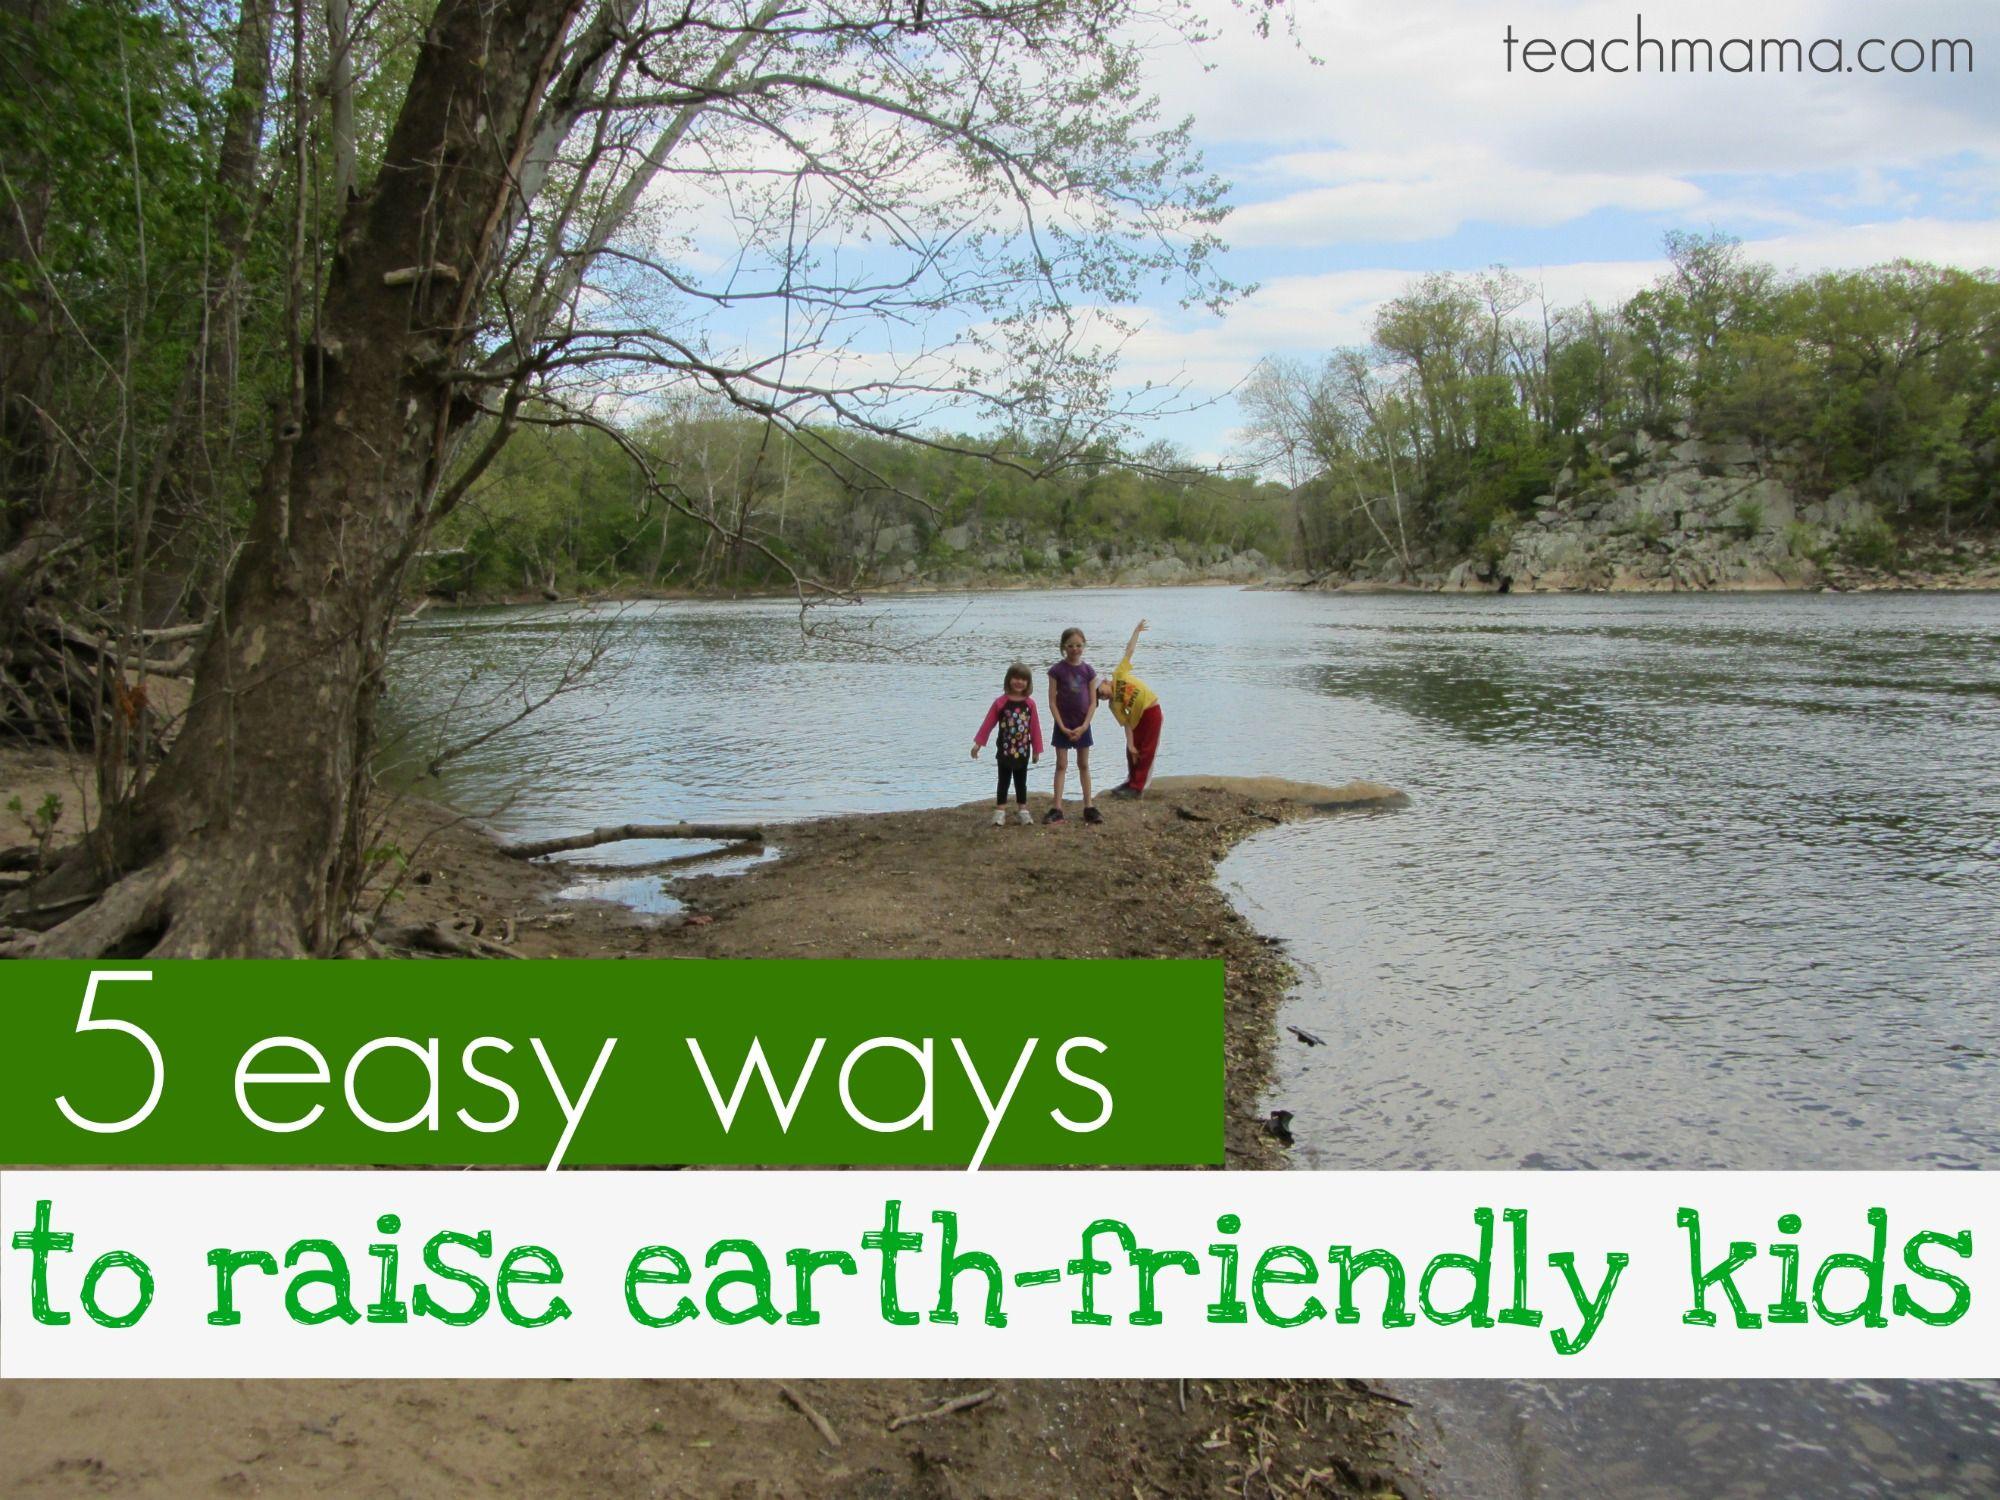 5 easy ways to raise earth-friendly kids #earthday